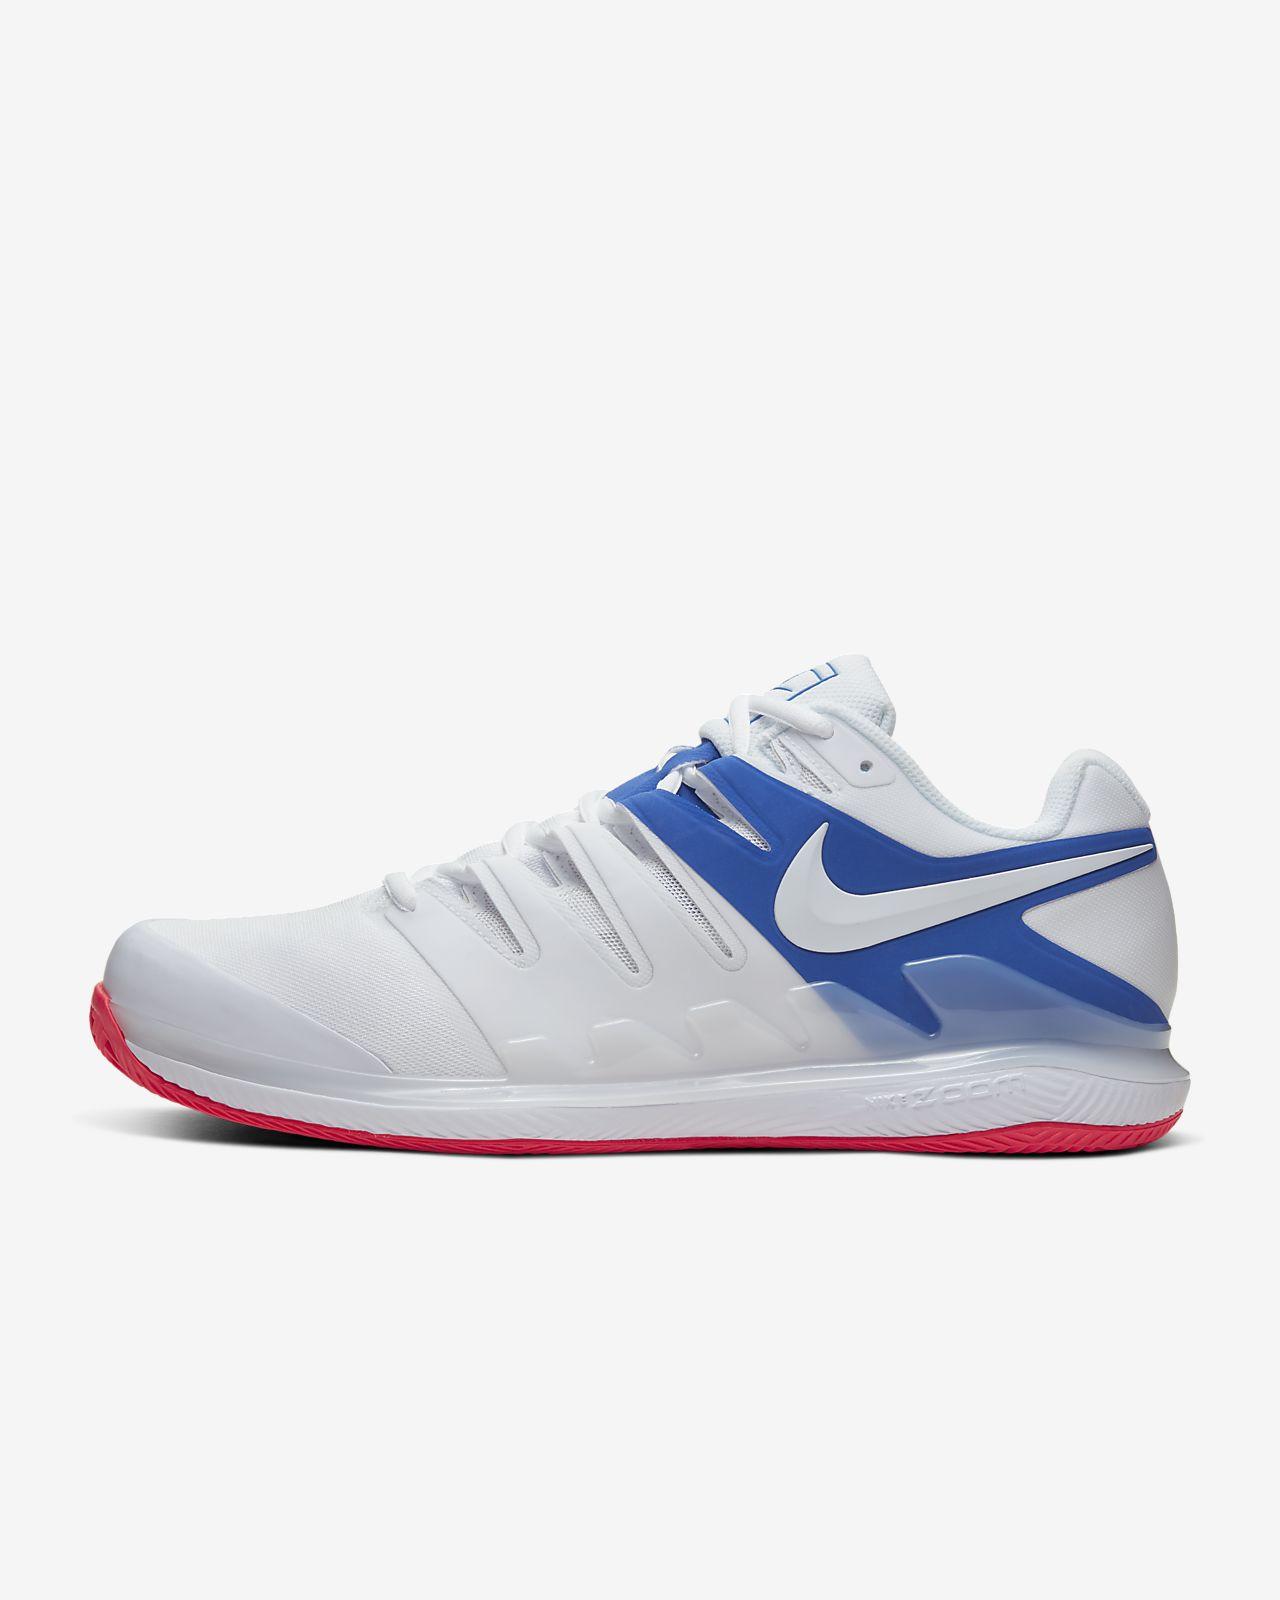 NikeCourt Air Zoom Vapor X Sabatilles de tennis per a terra batuda - Home